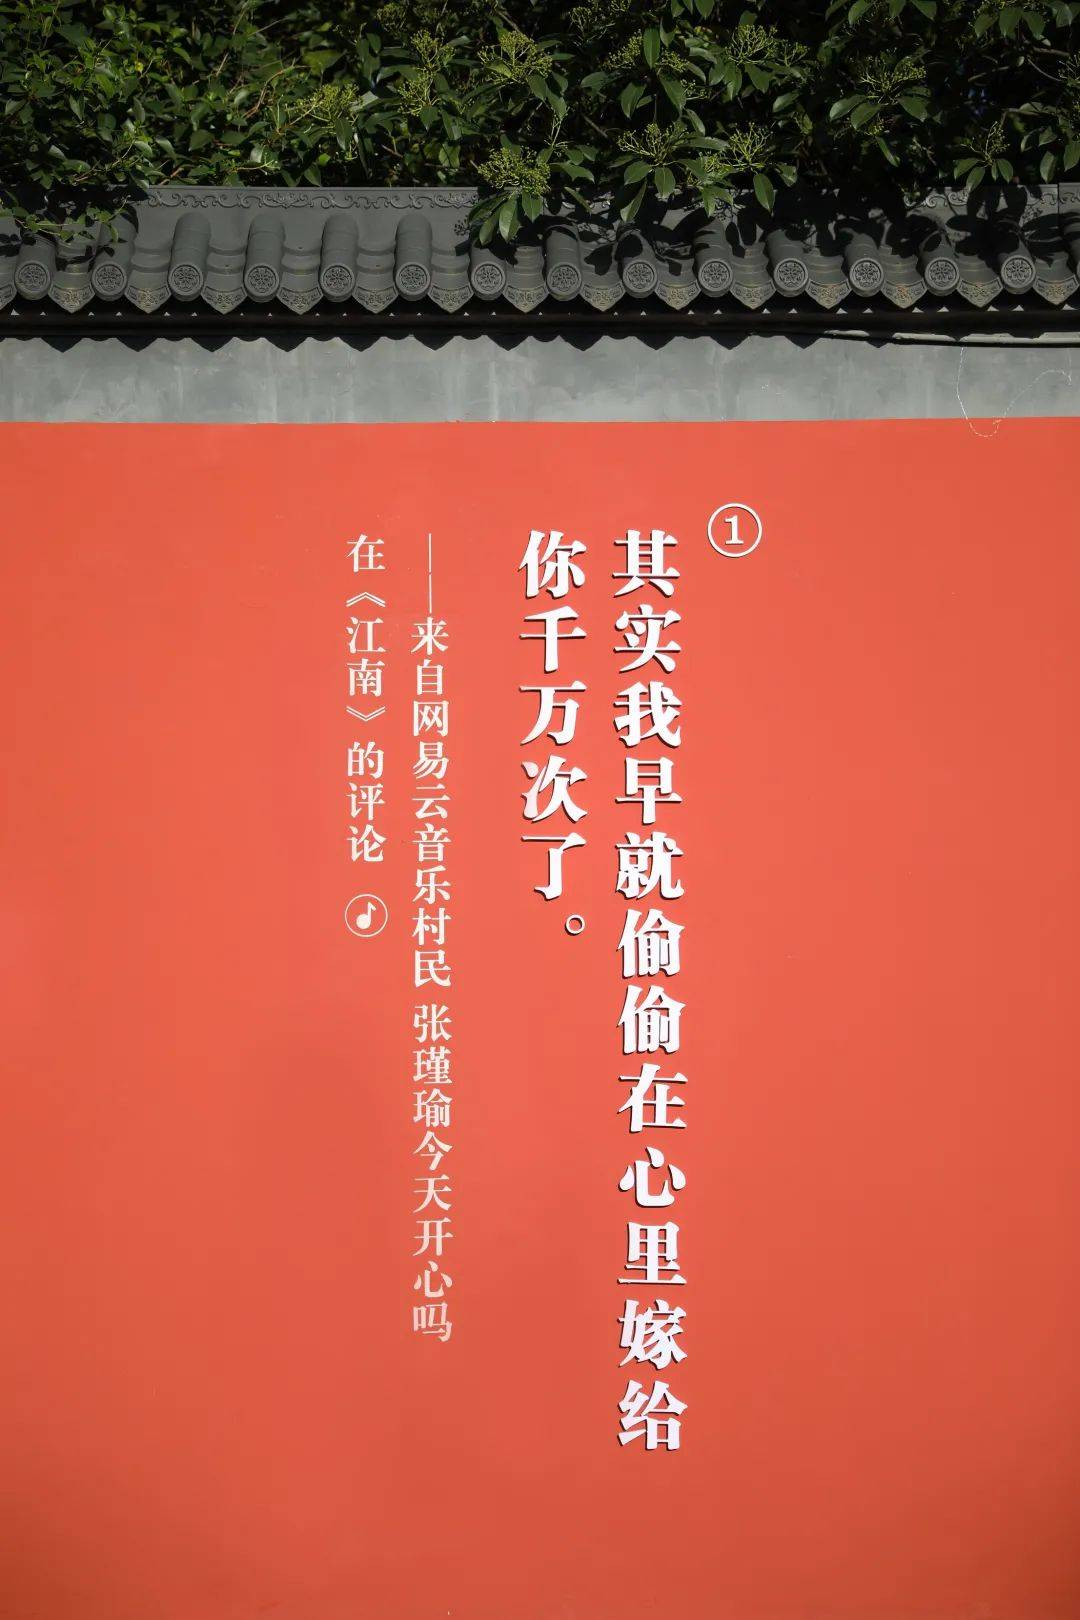 16822083896141aaa015f3b7.82797676 - 网易云音乐,一本情感营销的教科书